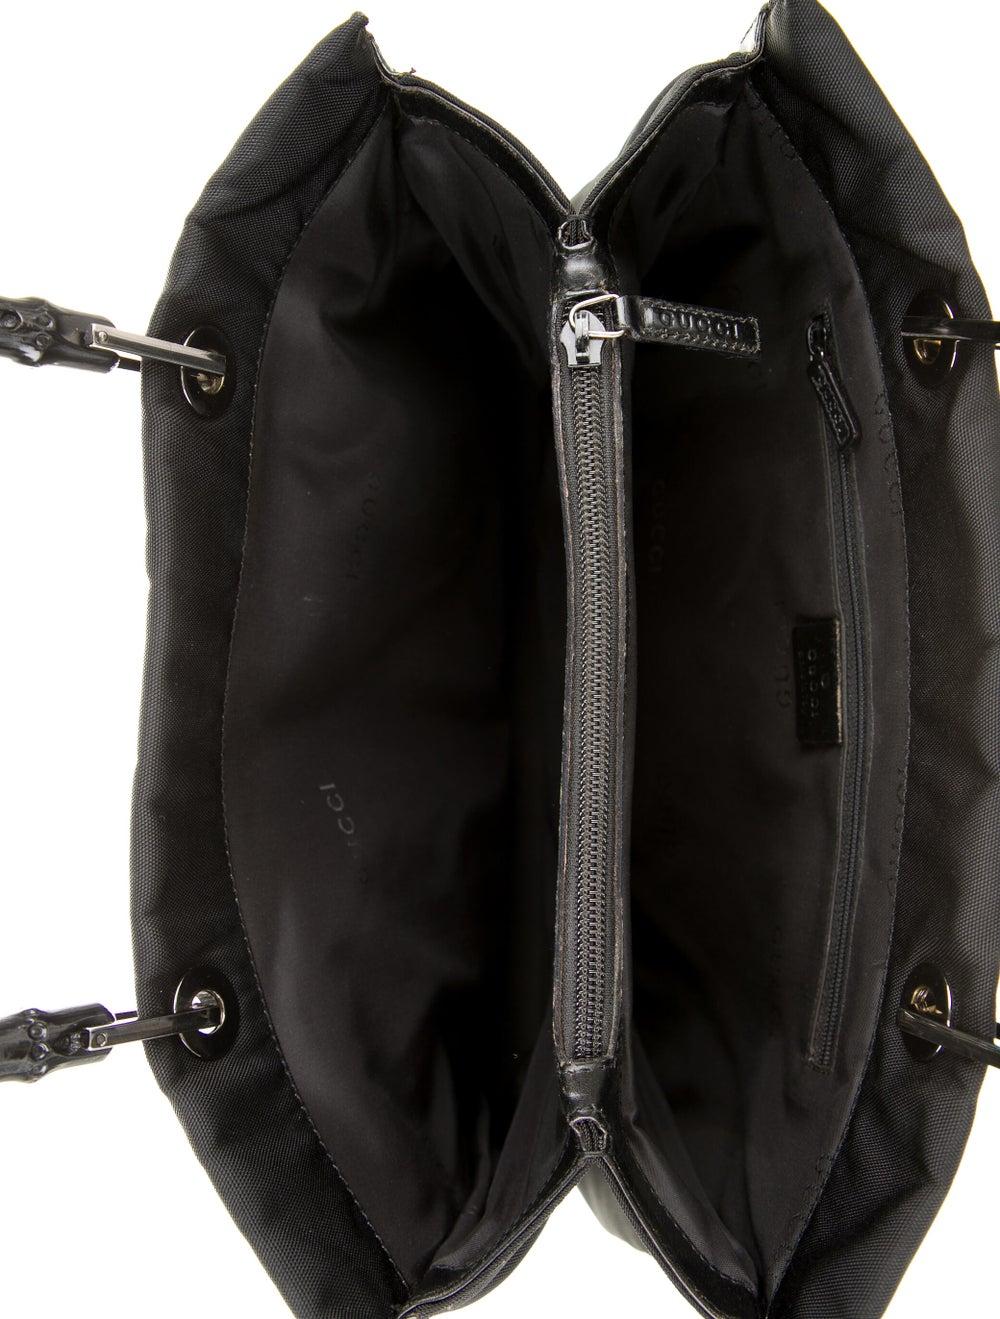 Gucci Nylon Bamboo Top Handle Bag Black - image 5